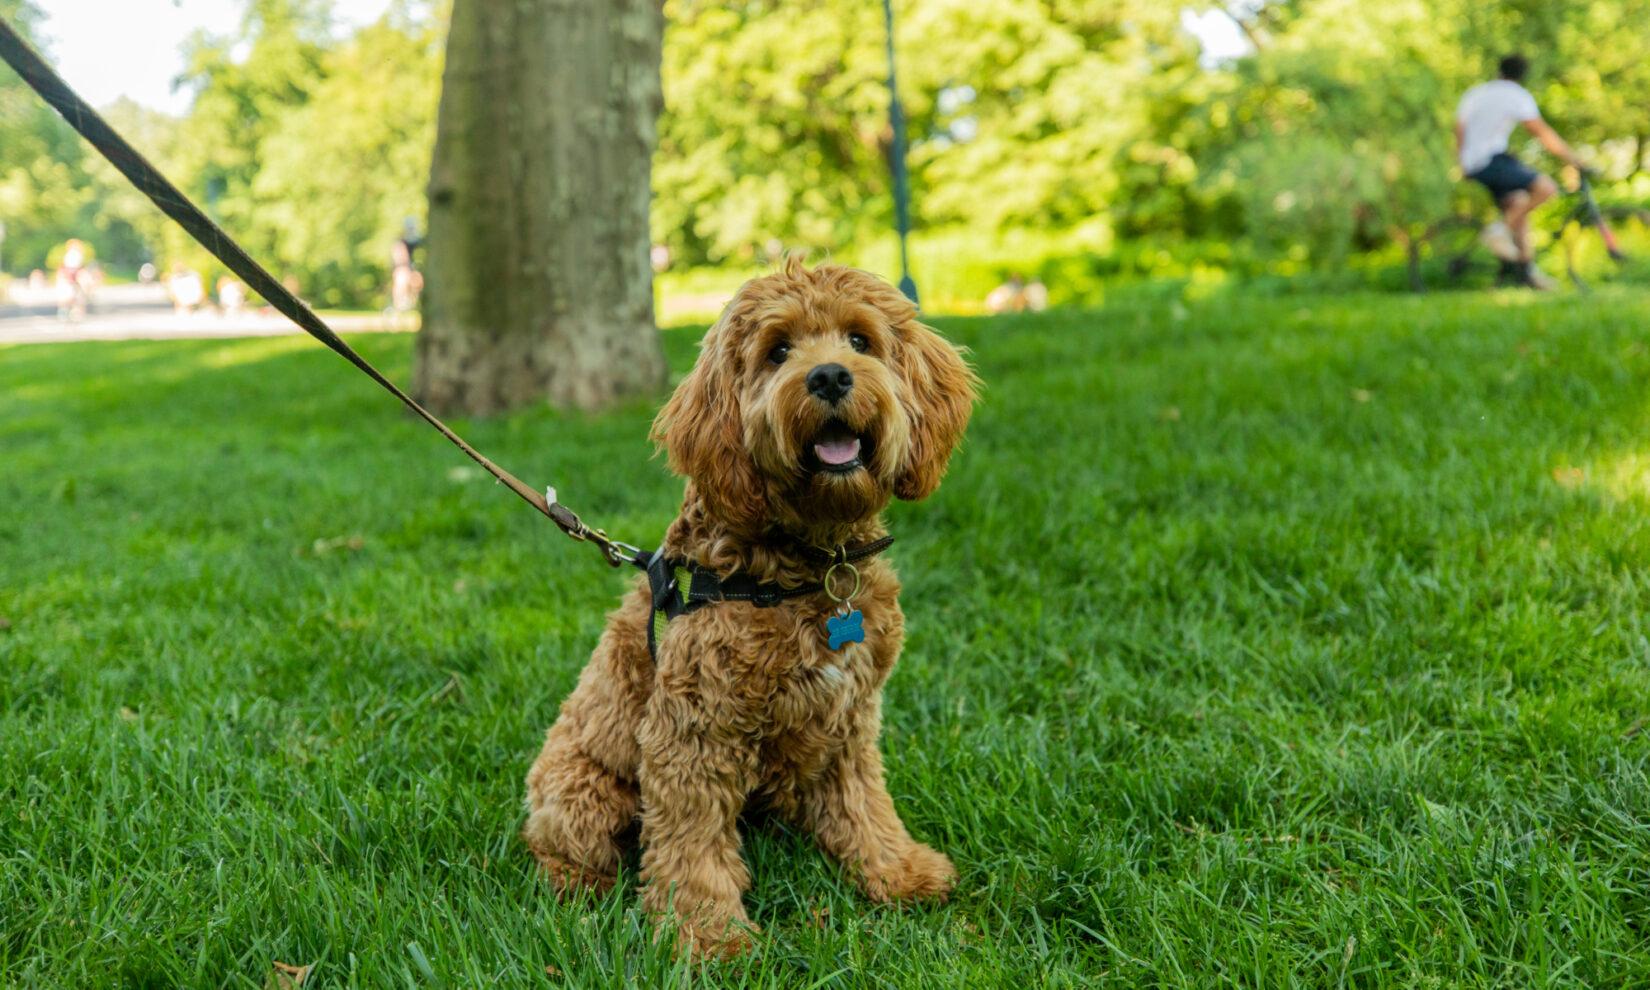 A happy, leashed dog enjoys the shade of a Park tree.